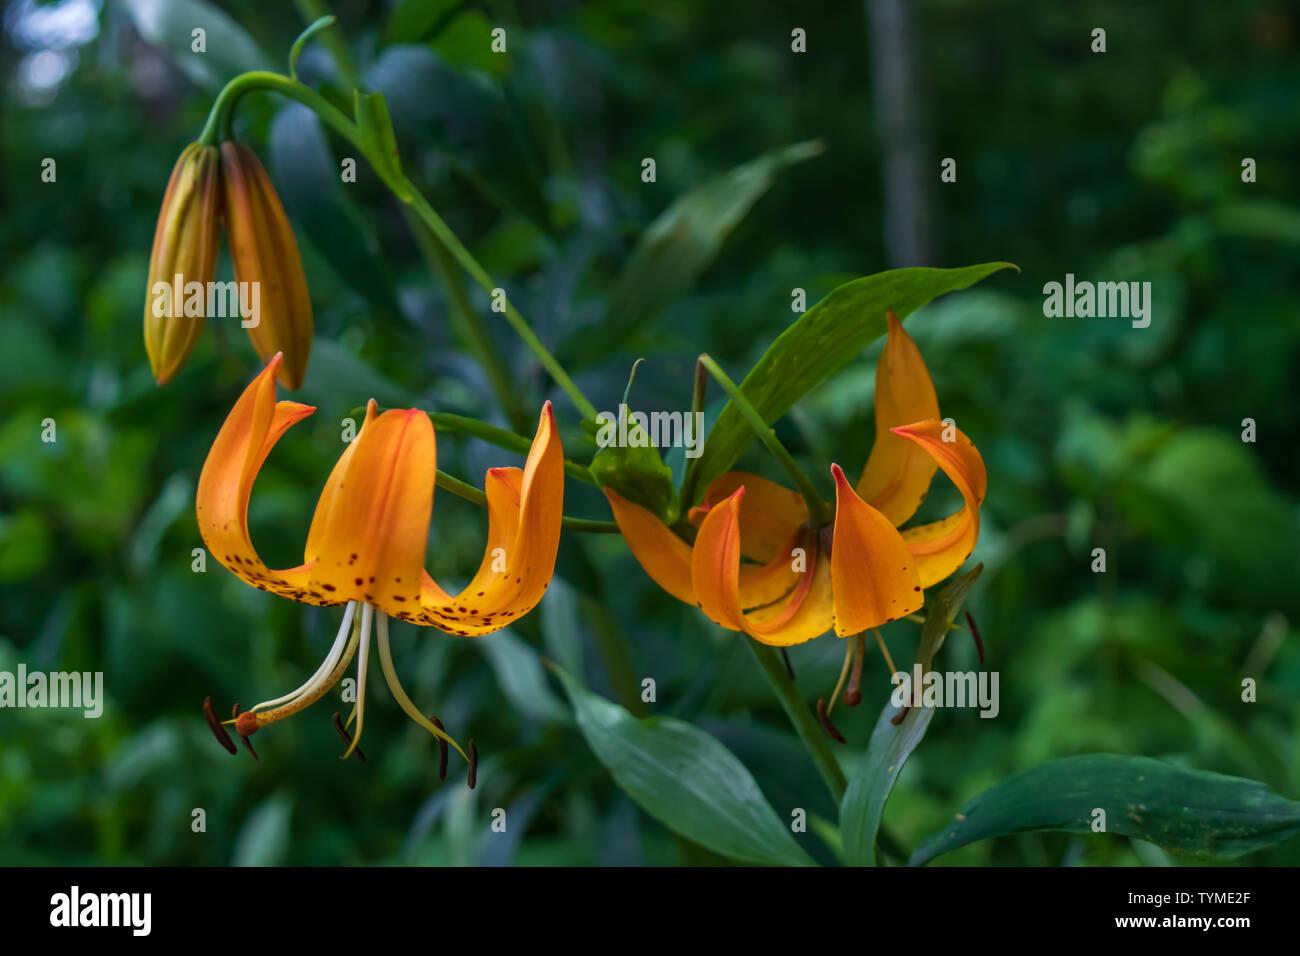 Turk's Cap Lily close-up Stock Photo